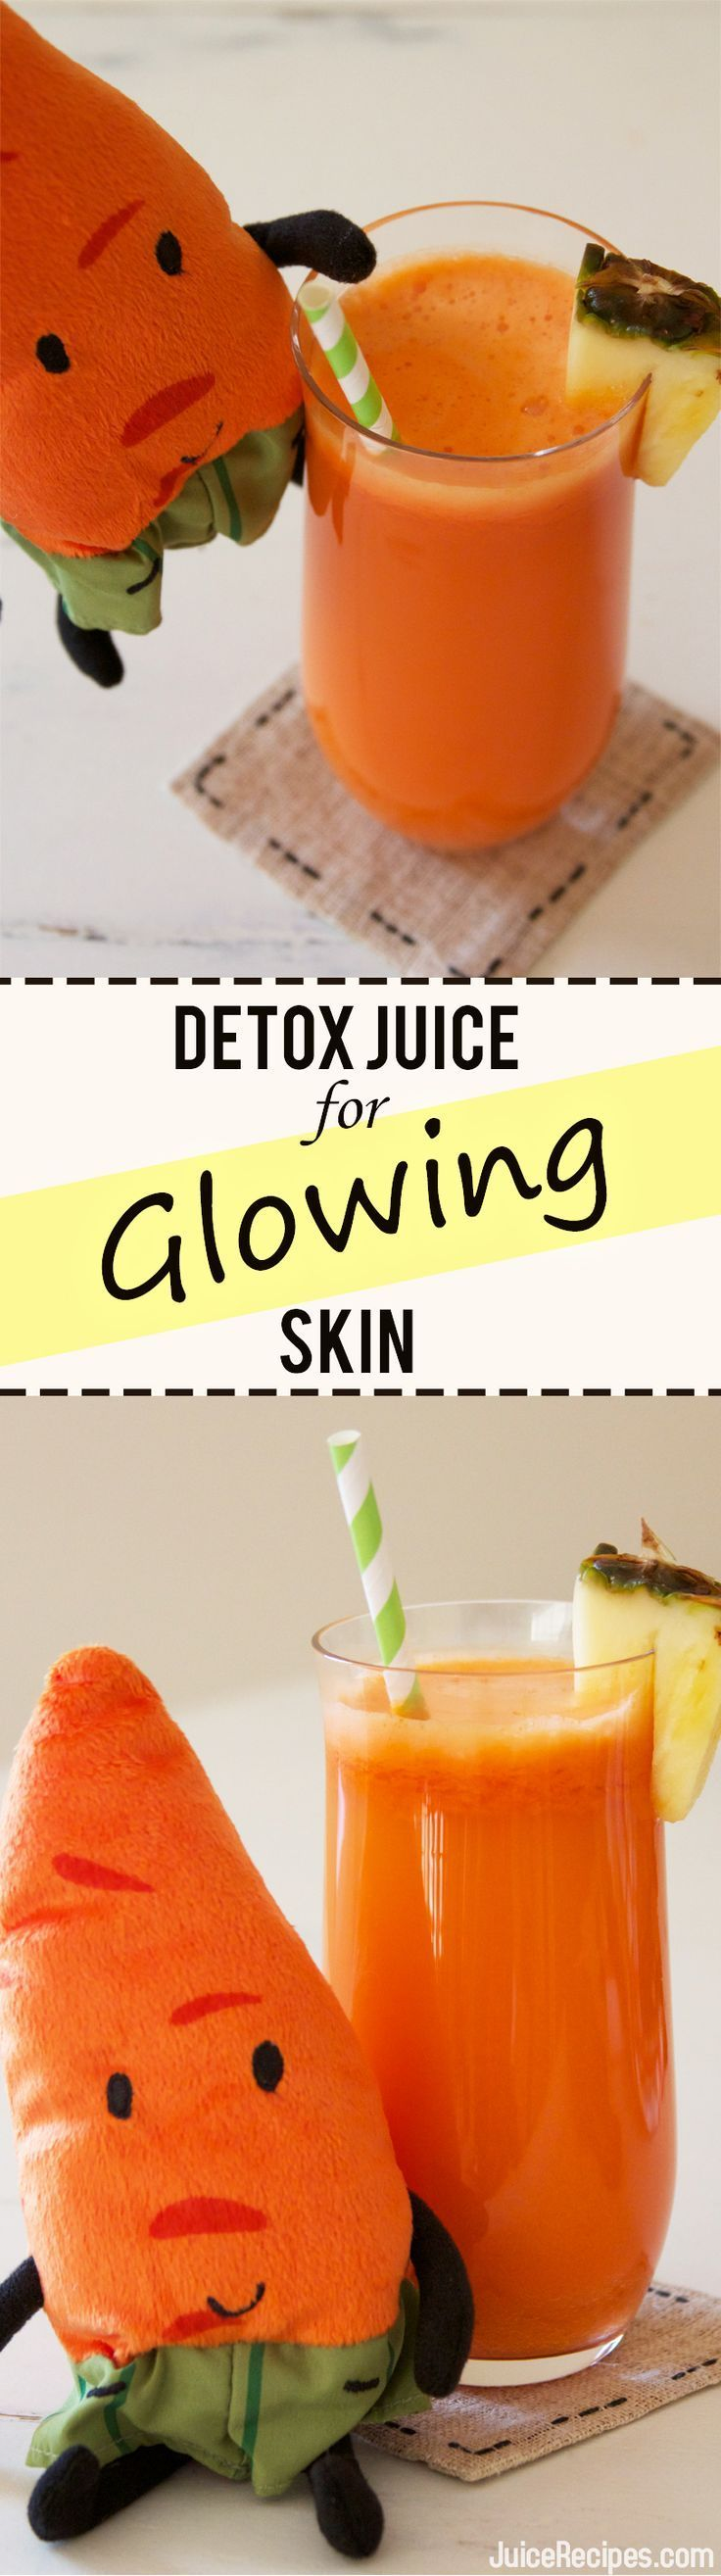 Sweet Satin Detox Juice for beautiful glowing skin, from http://JuiceRecipes.com. #naturalskincare #skincareproducts #Australianskincare #AqiskinCare�